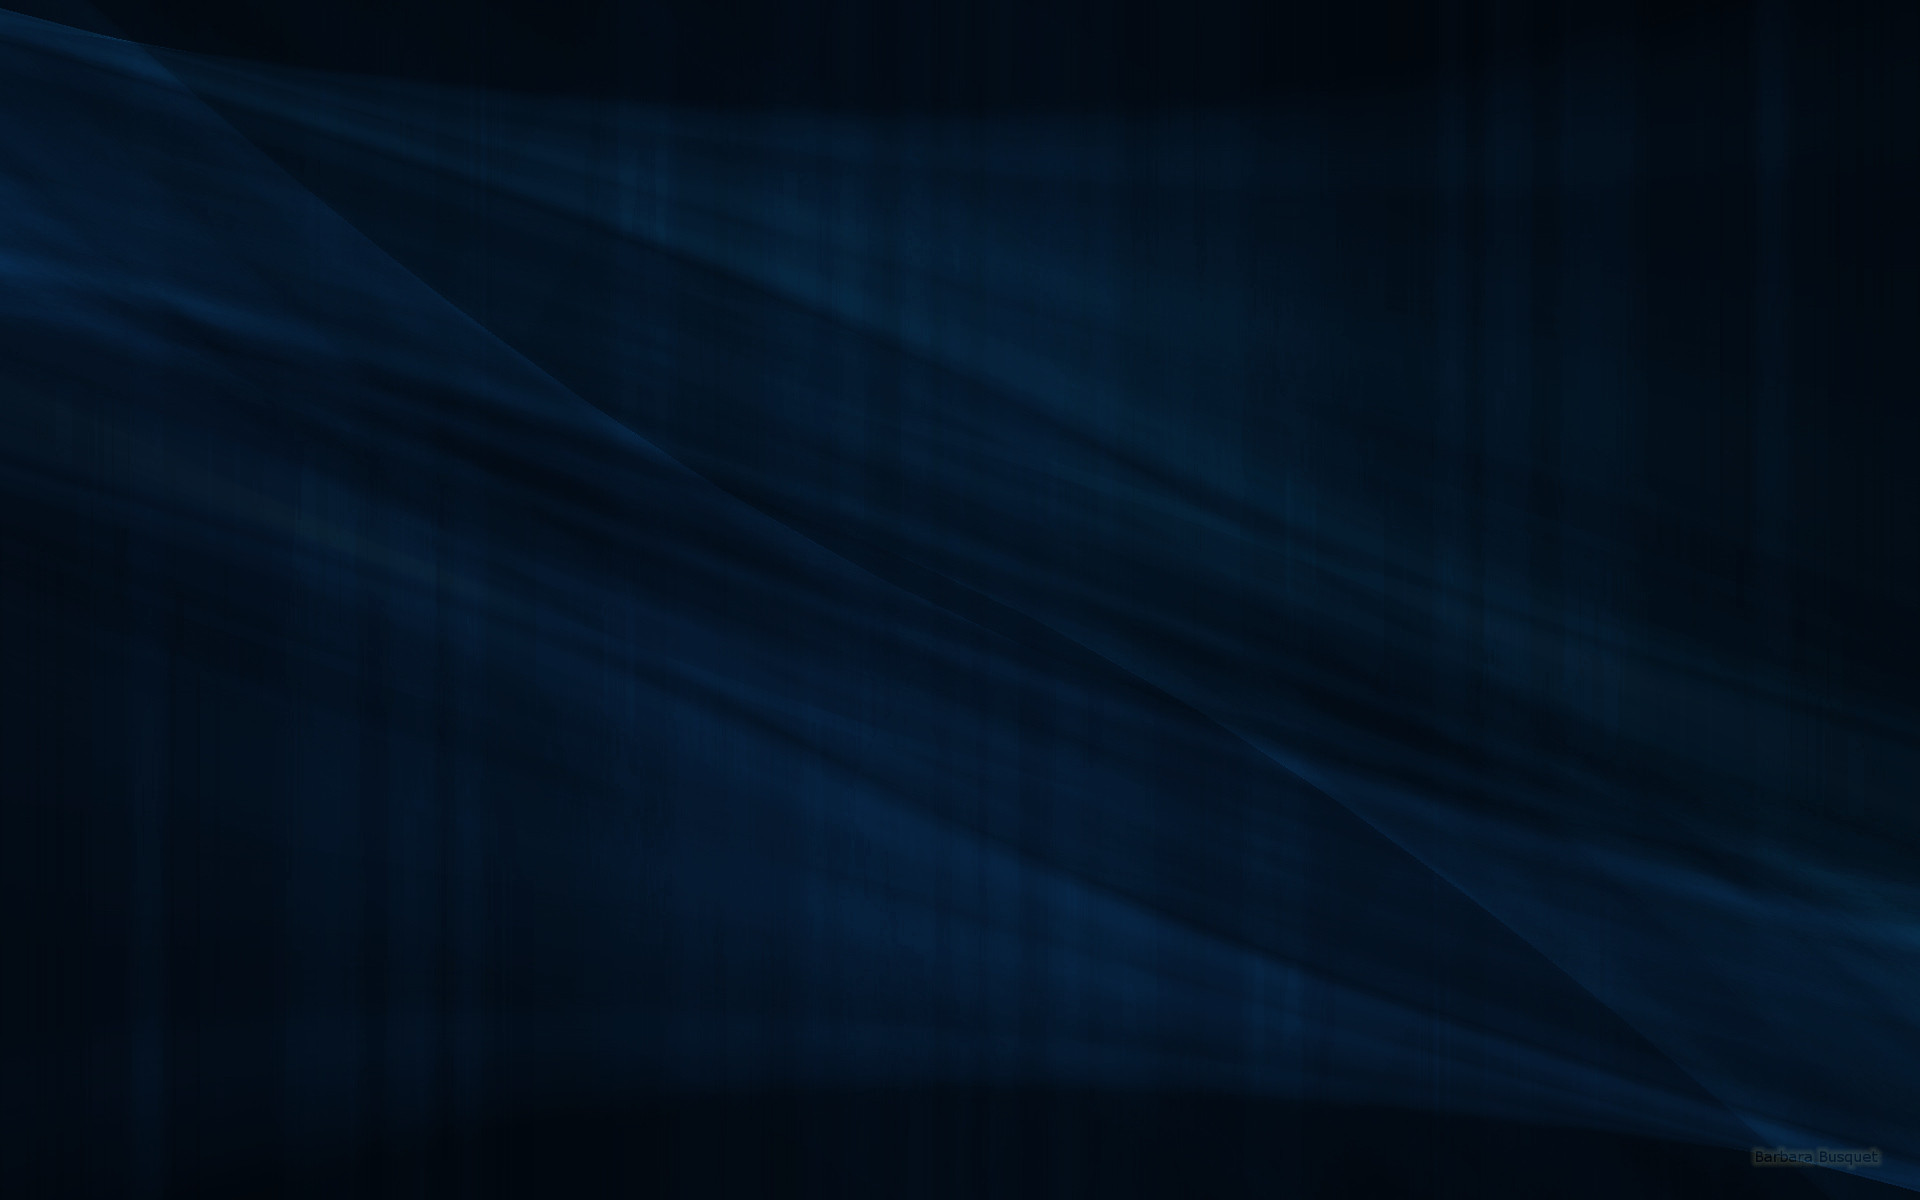 Dark Blue Background Images Wallpapertag: Dark Blue Vertical Lines